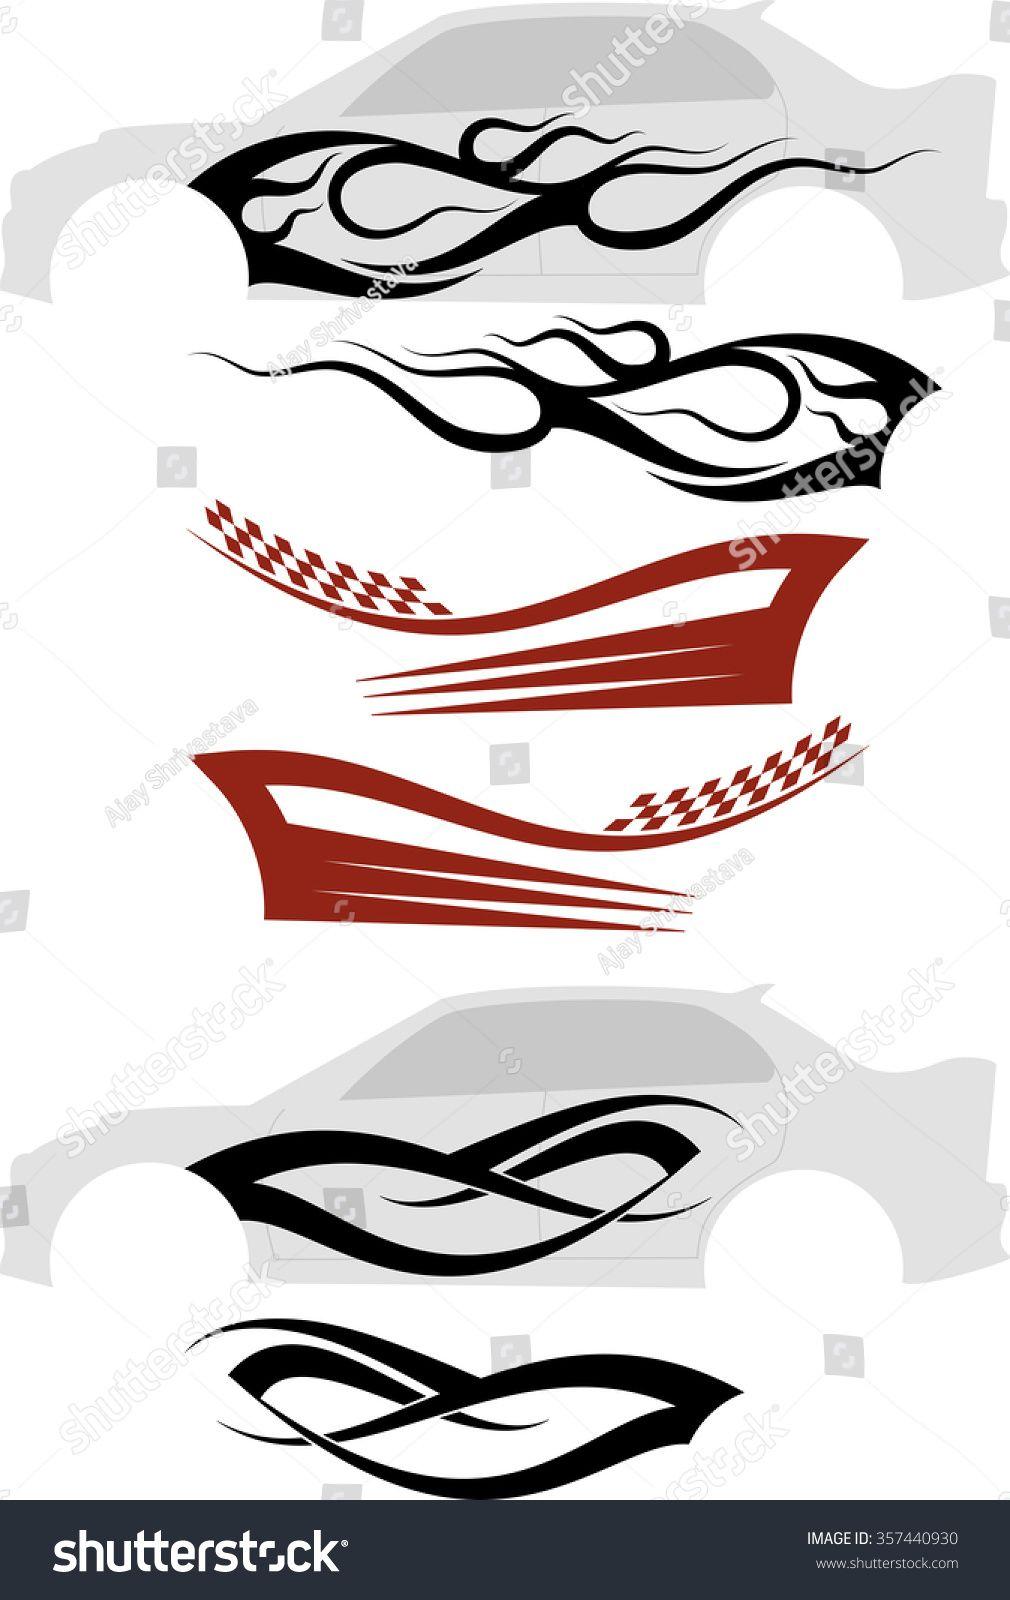 Ilustracoes Stock Imagens E Vetores De Vehicle Graphics Stripe Vinyl Ready Raster 357440930 Car Brands Logos Body Stickers Motorcycle Tank [ 1600 x 1010 Pixel ]